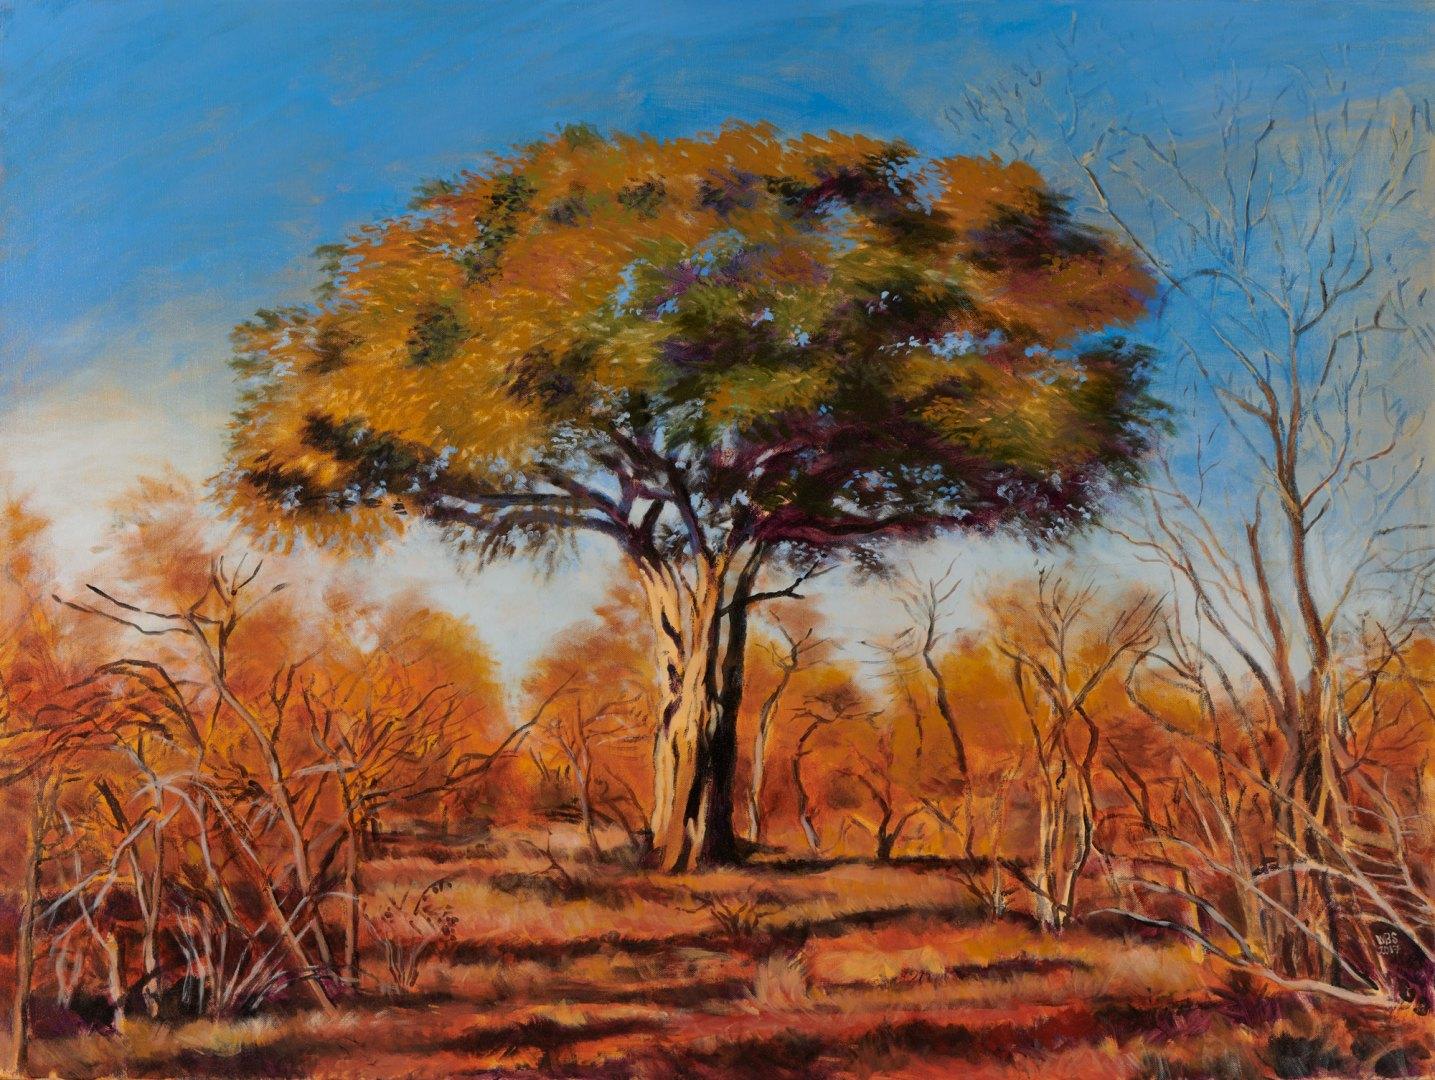 Green thorn, acrylic on canvas, 122 cm x 91 cm, SOLD